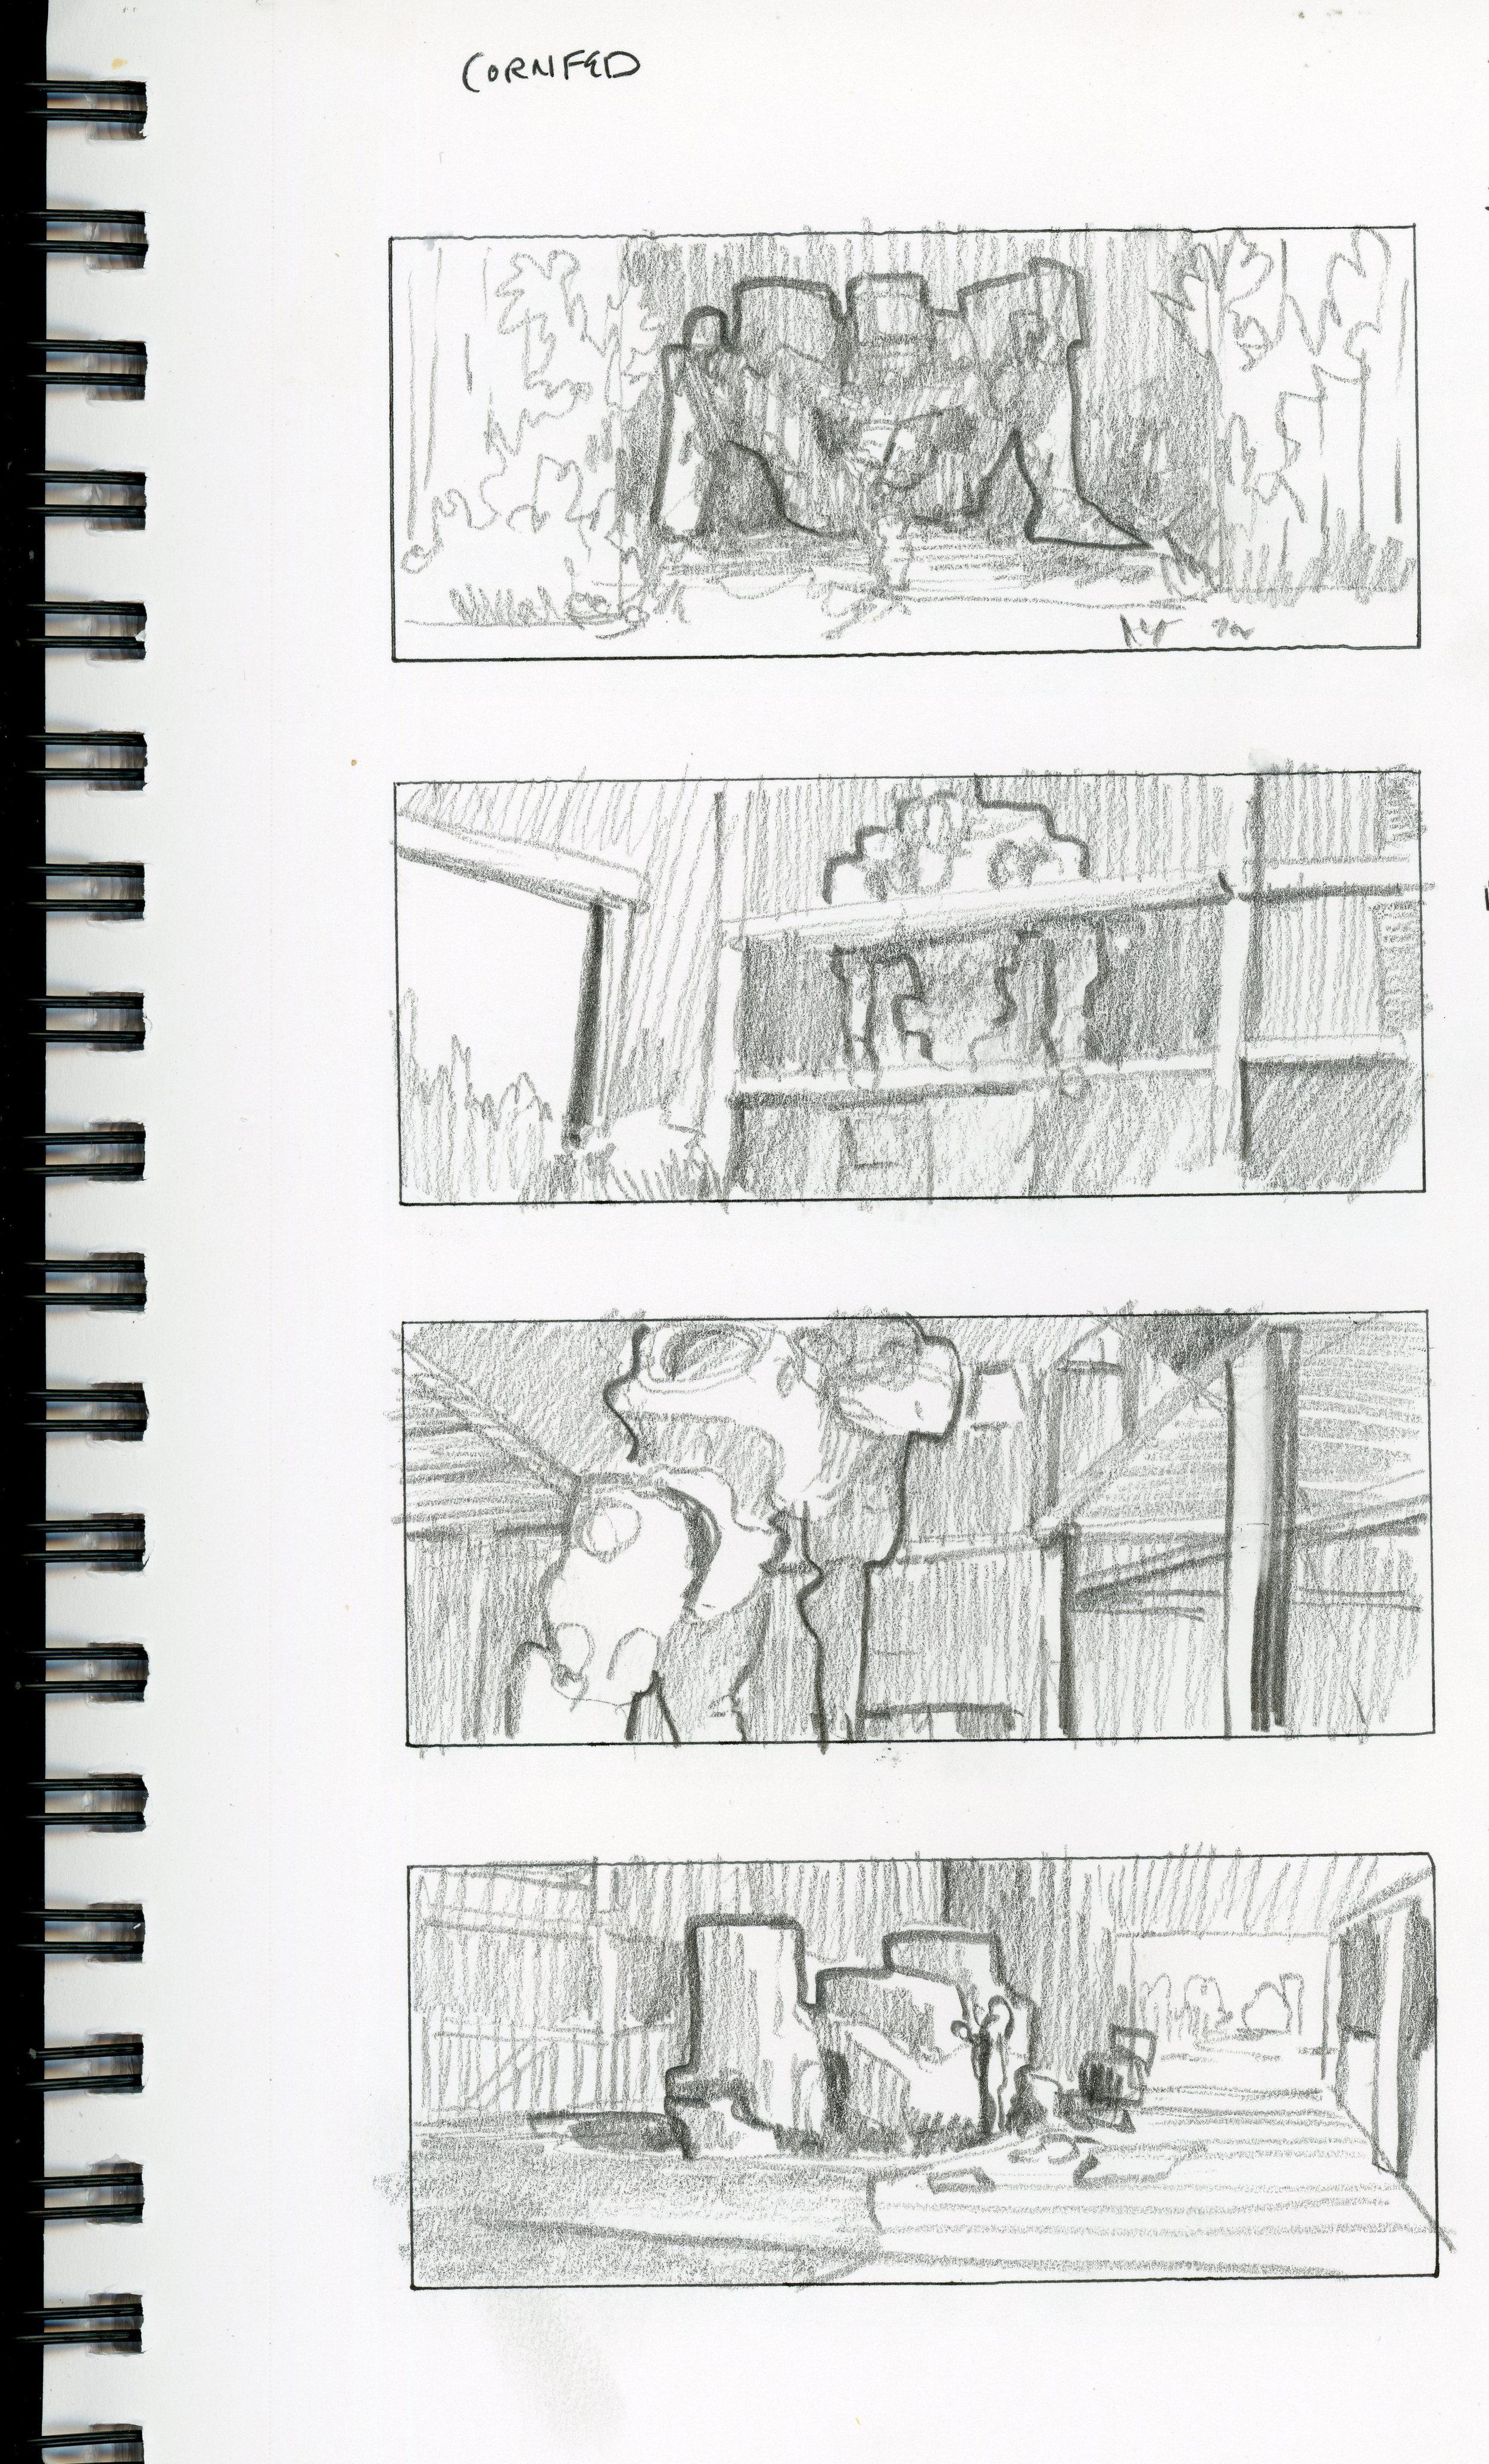 EYazel_Sketchbook_MayOct016_02.jpg